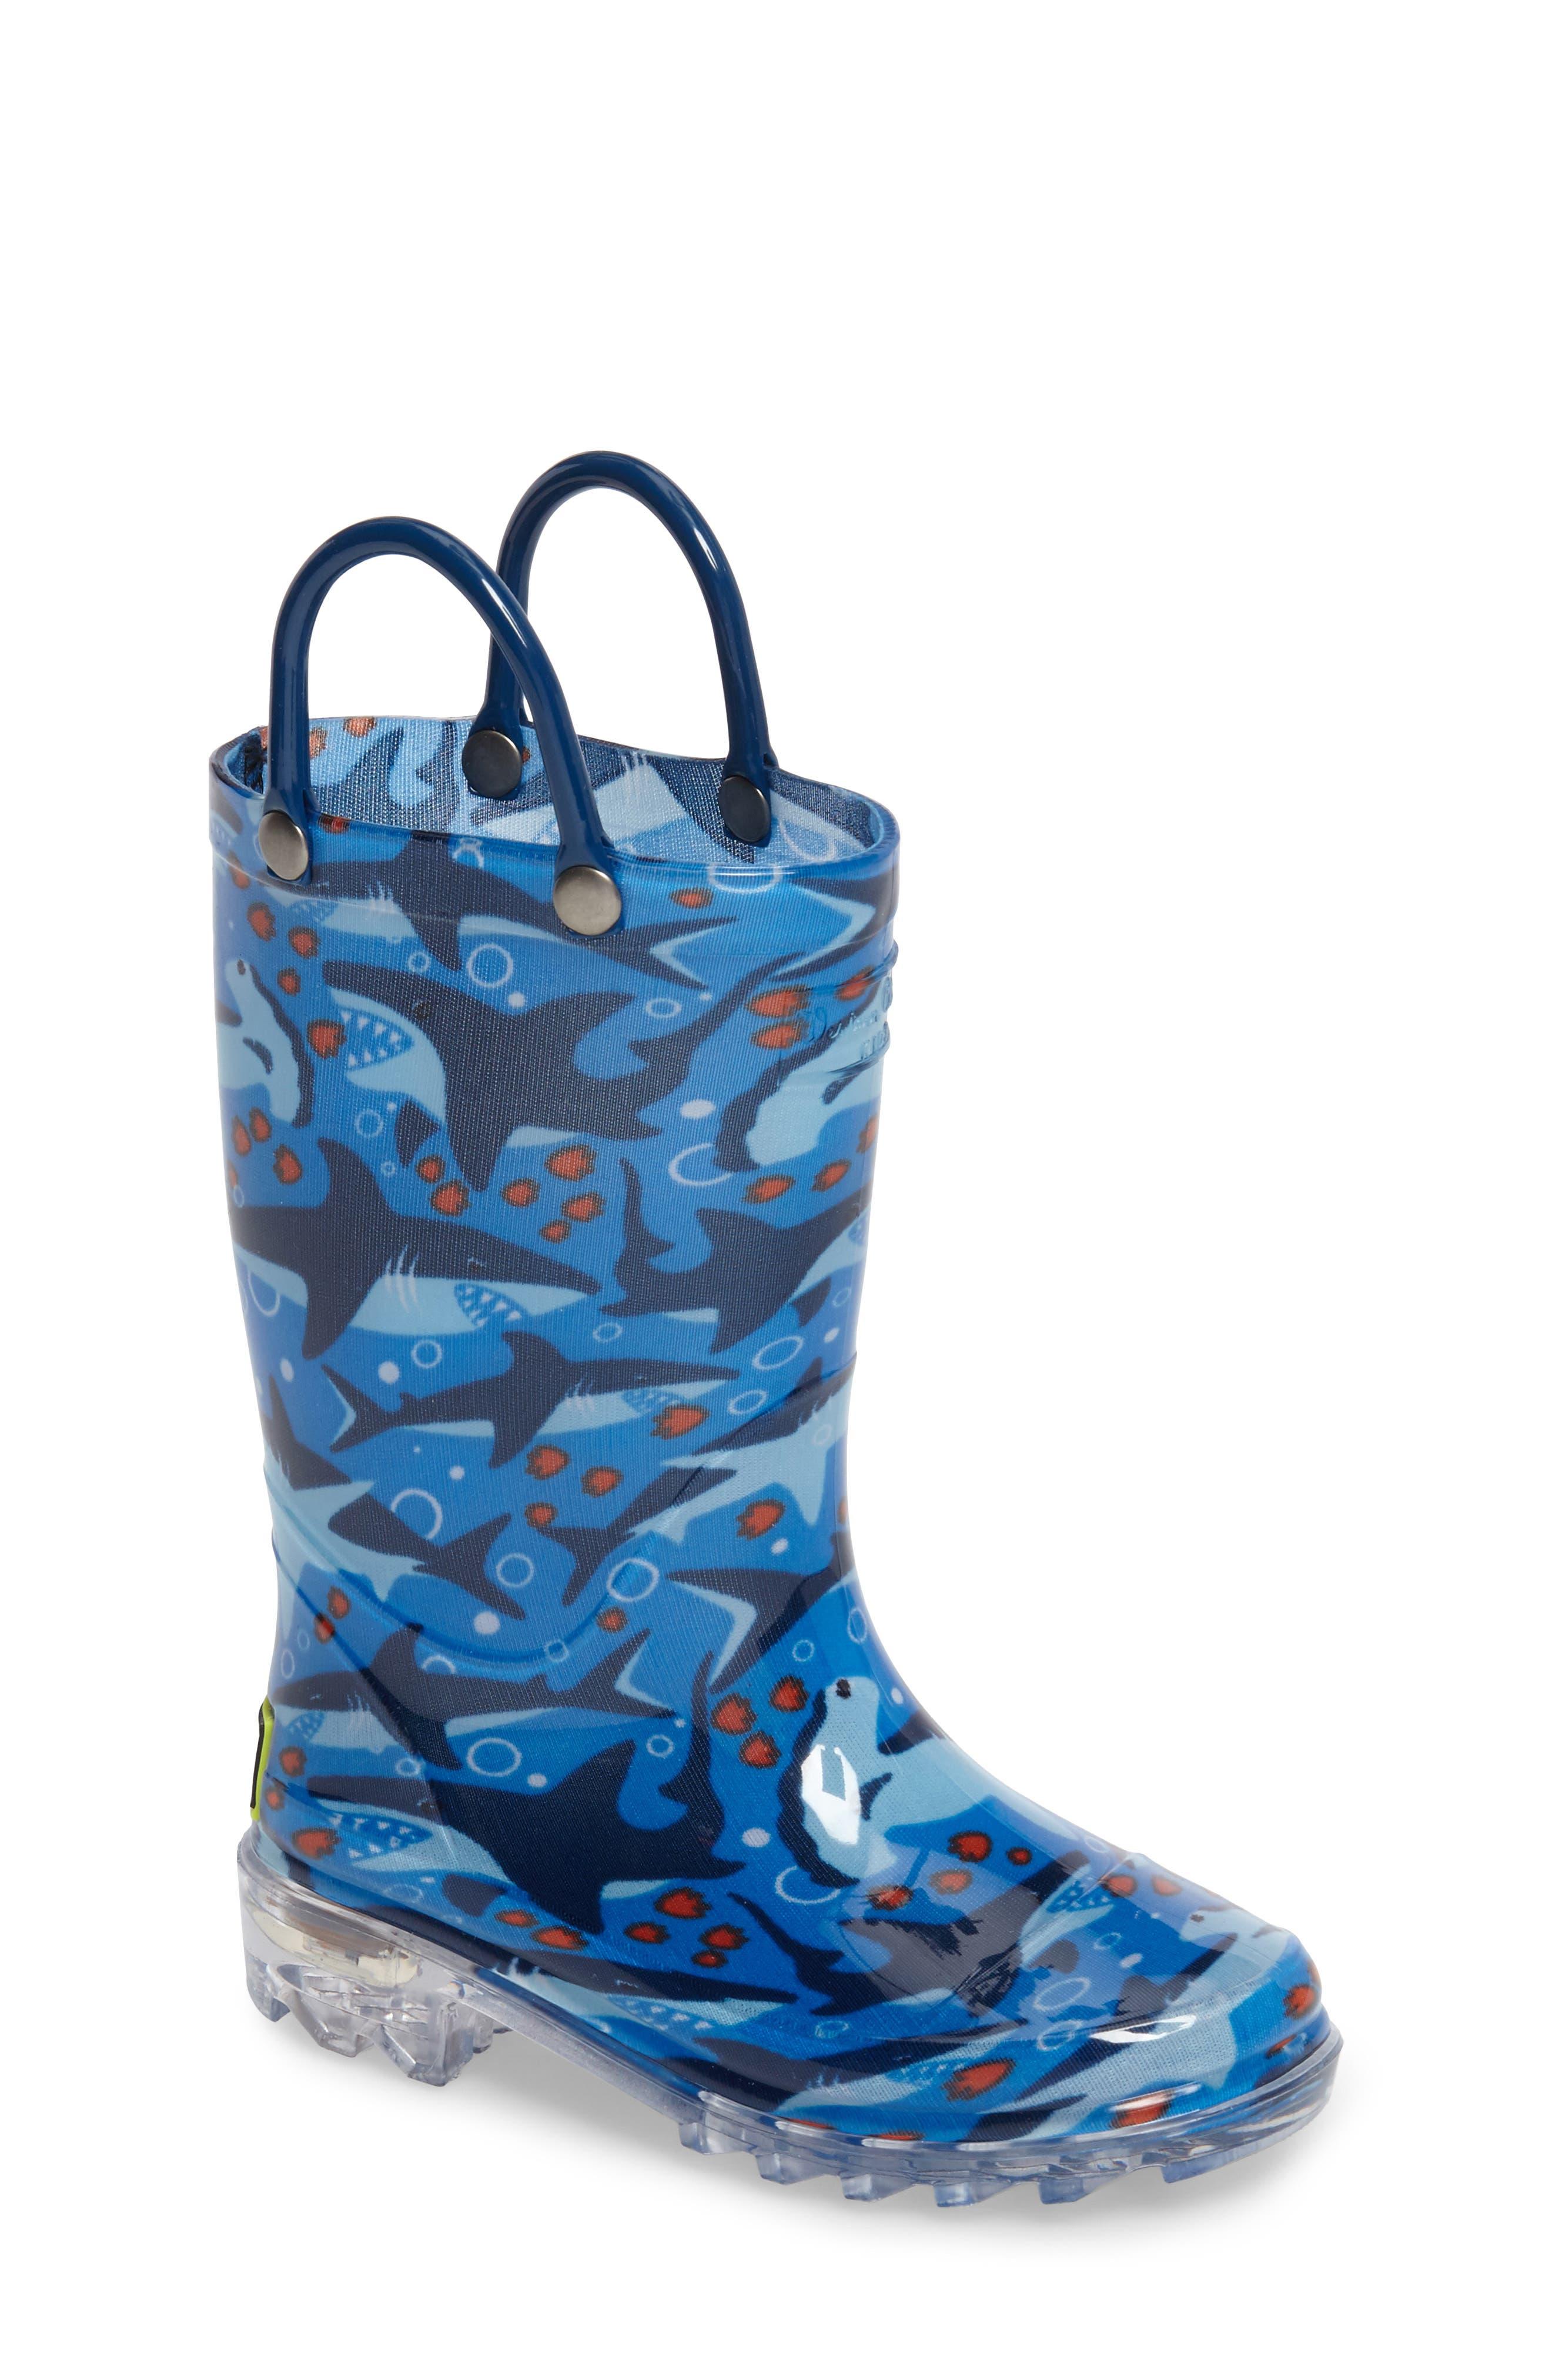 Shark Chase Light-Up Rain Boot,                         Main,                         color, 420